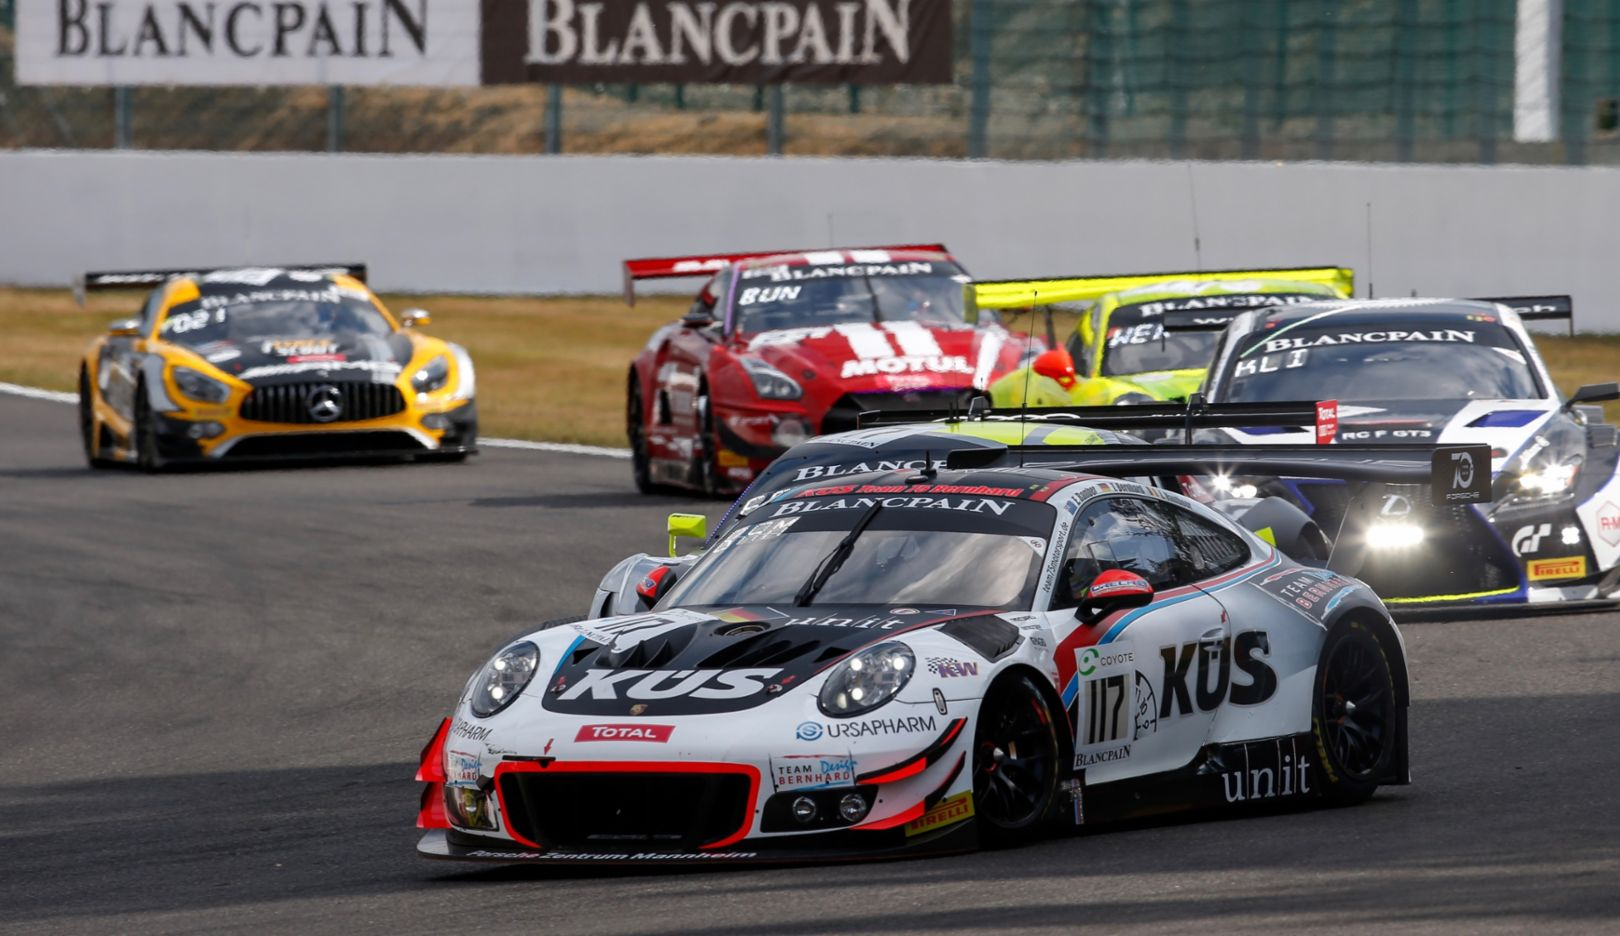 911 GT3 R, KÜS Team75 Bernhard, Timo Bernhard, Earl Bamber, Laurens Vanthoor, Spa-Francorchamps, 2018, Porsche AG